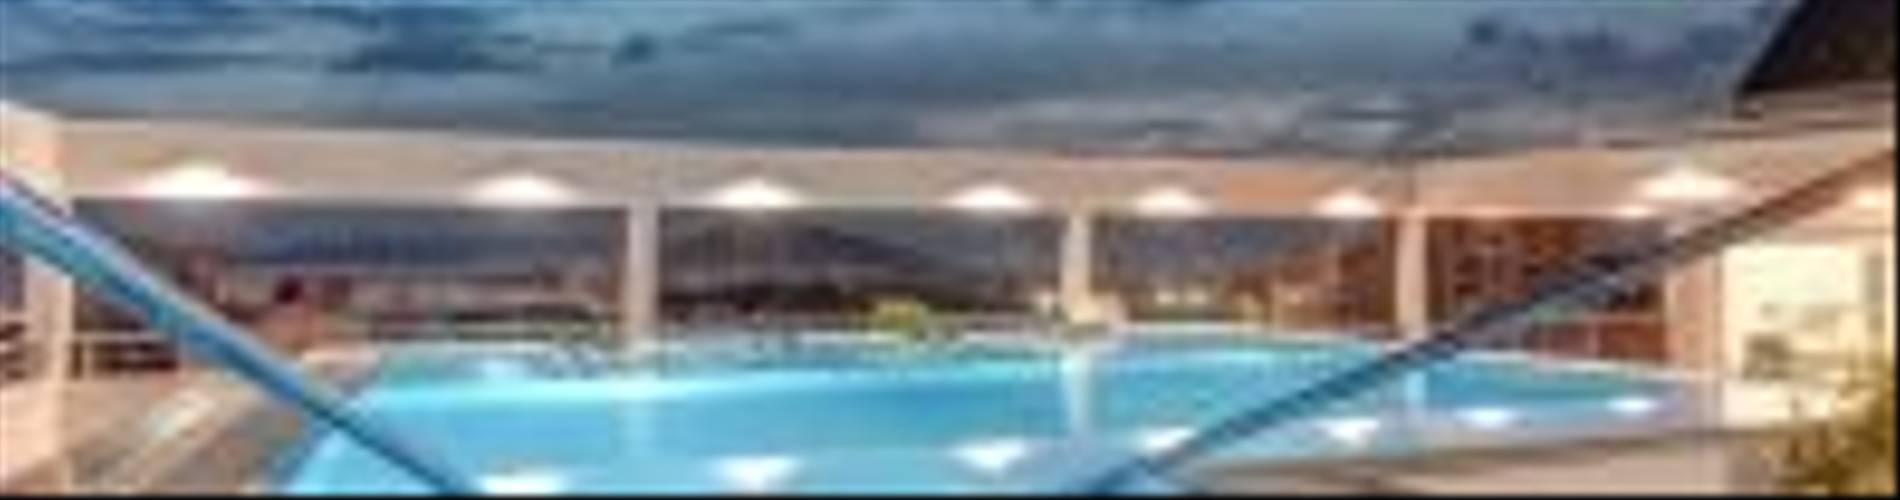 HotelResidence_DIOKLECIJAN_rooftop-pool-night-panorama-wide_2048px_3S8C1766-198x120.jpg